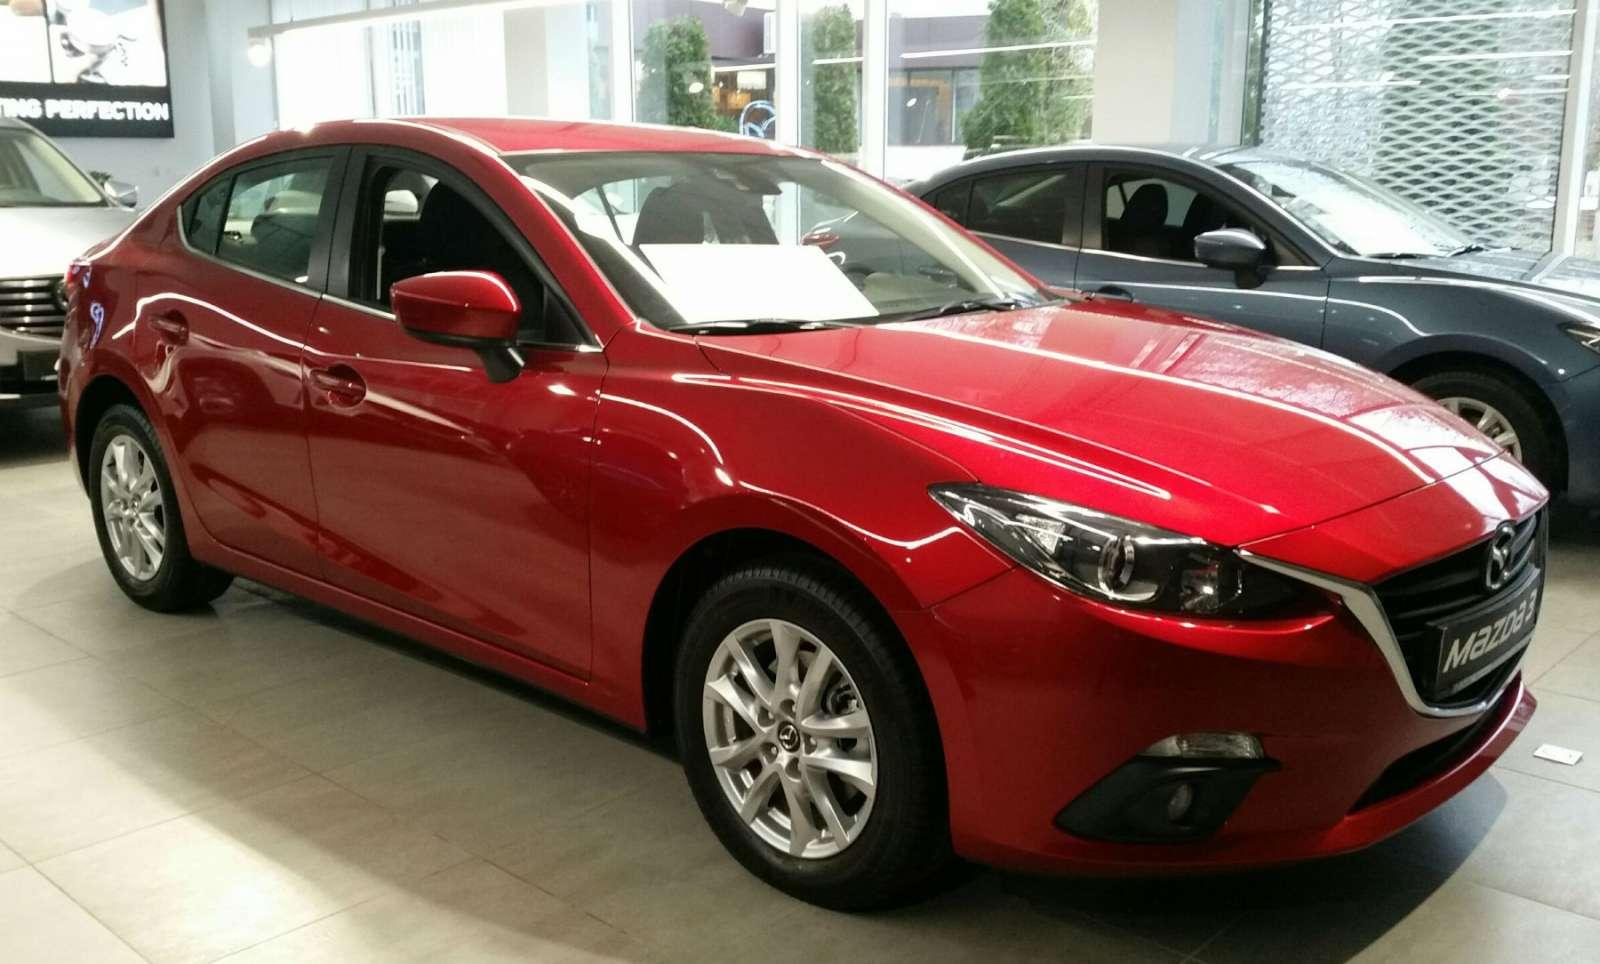 Startul reducerilor în Showroom-ul Mazda Moldova